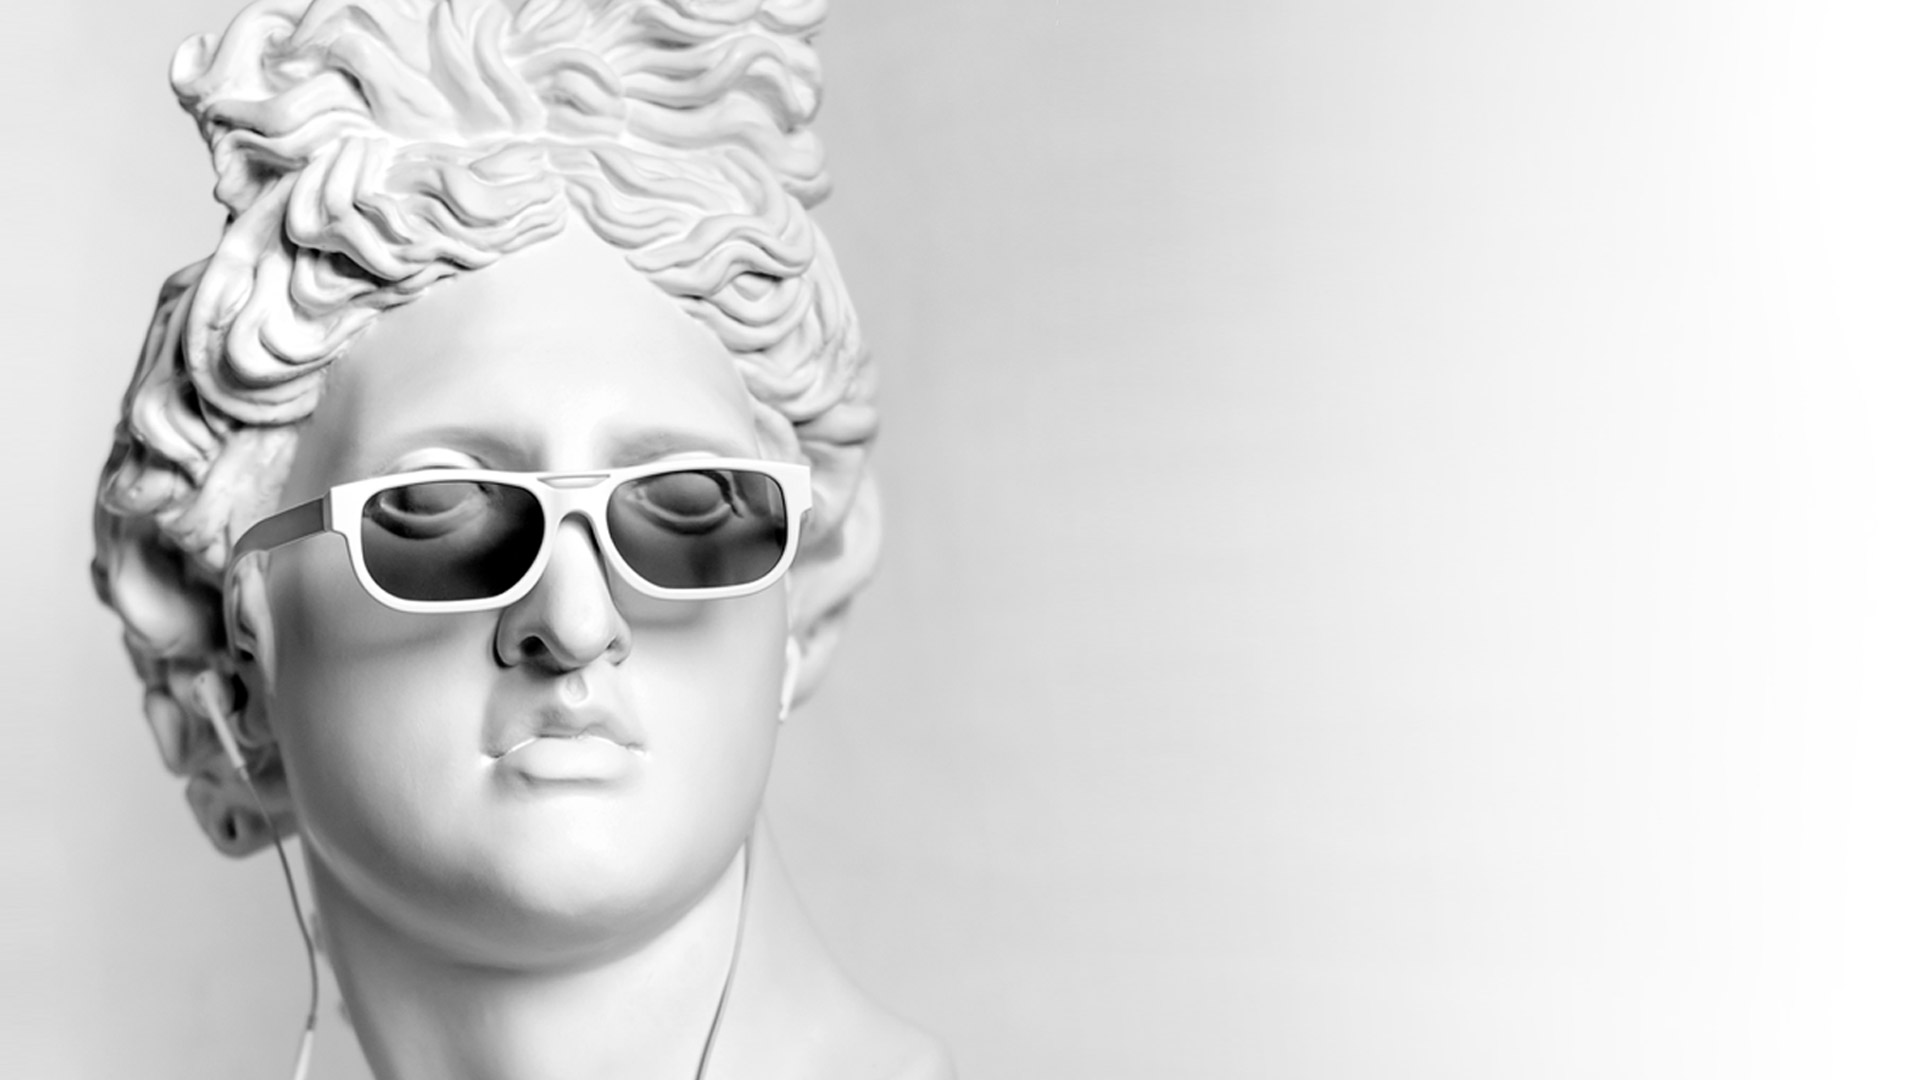 cool statue